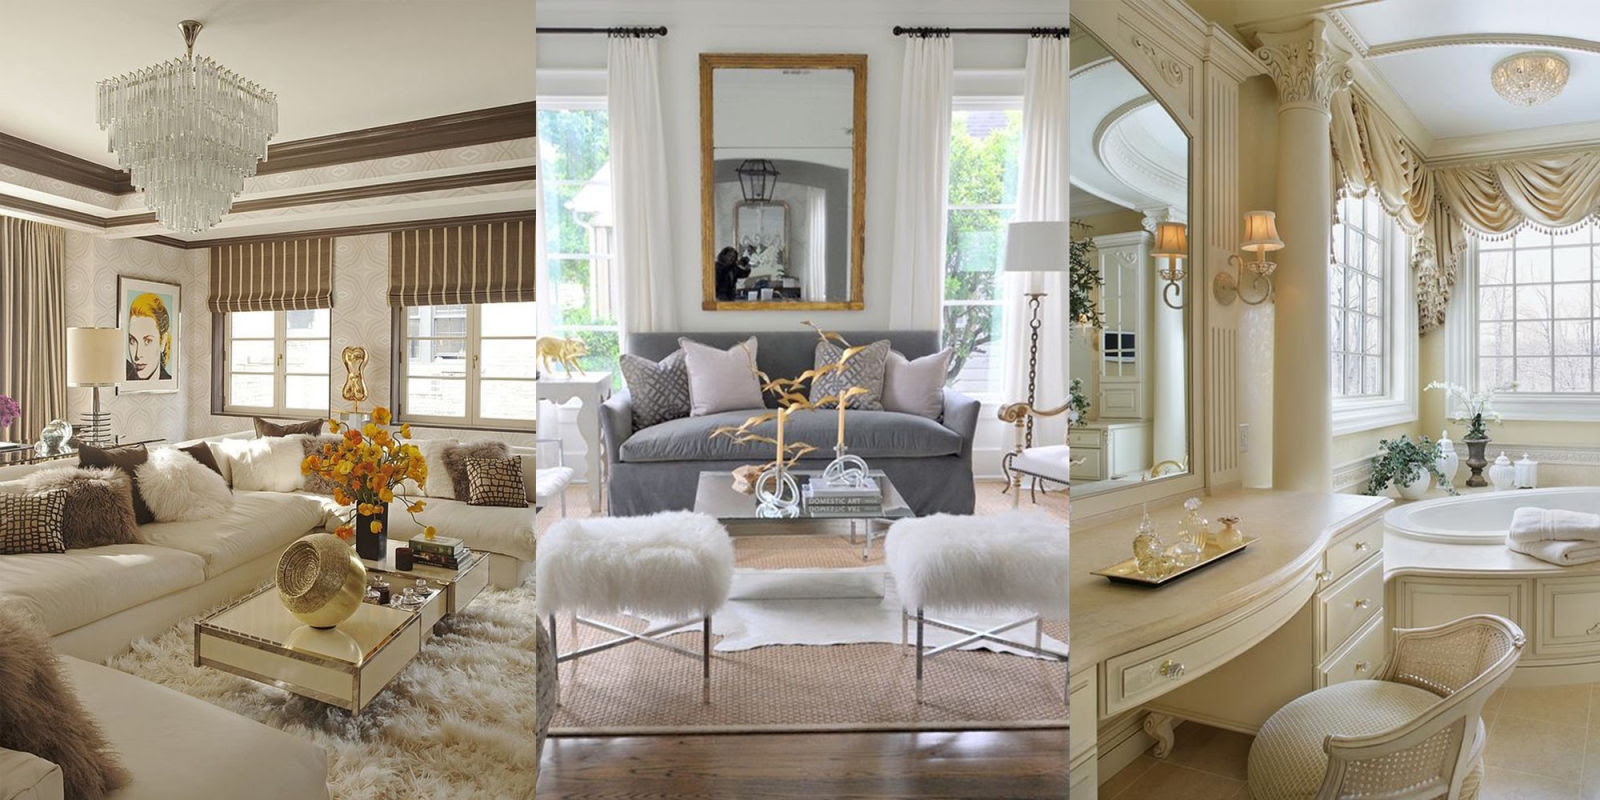 Contemporary Loft Design Ideas | Furniture & Home Design Ideas